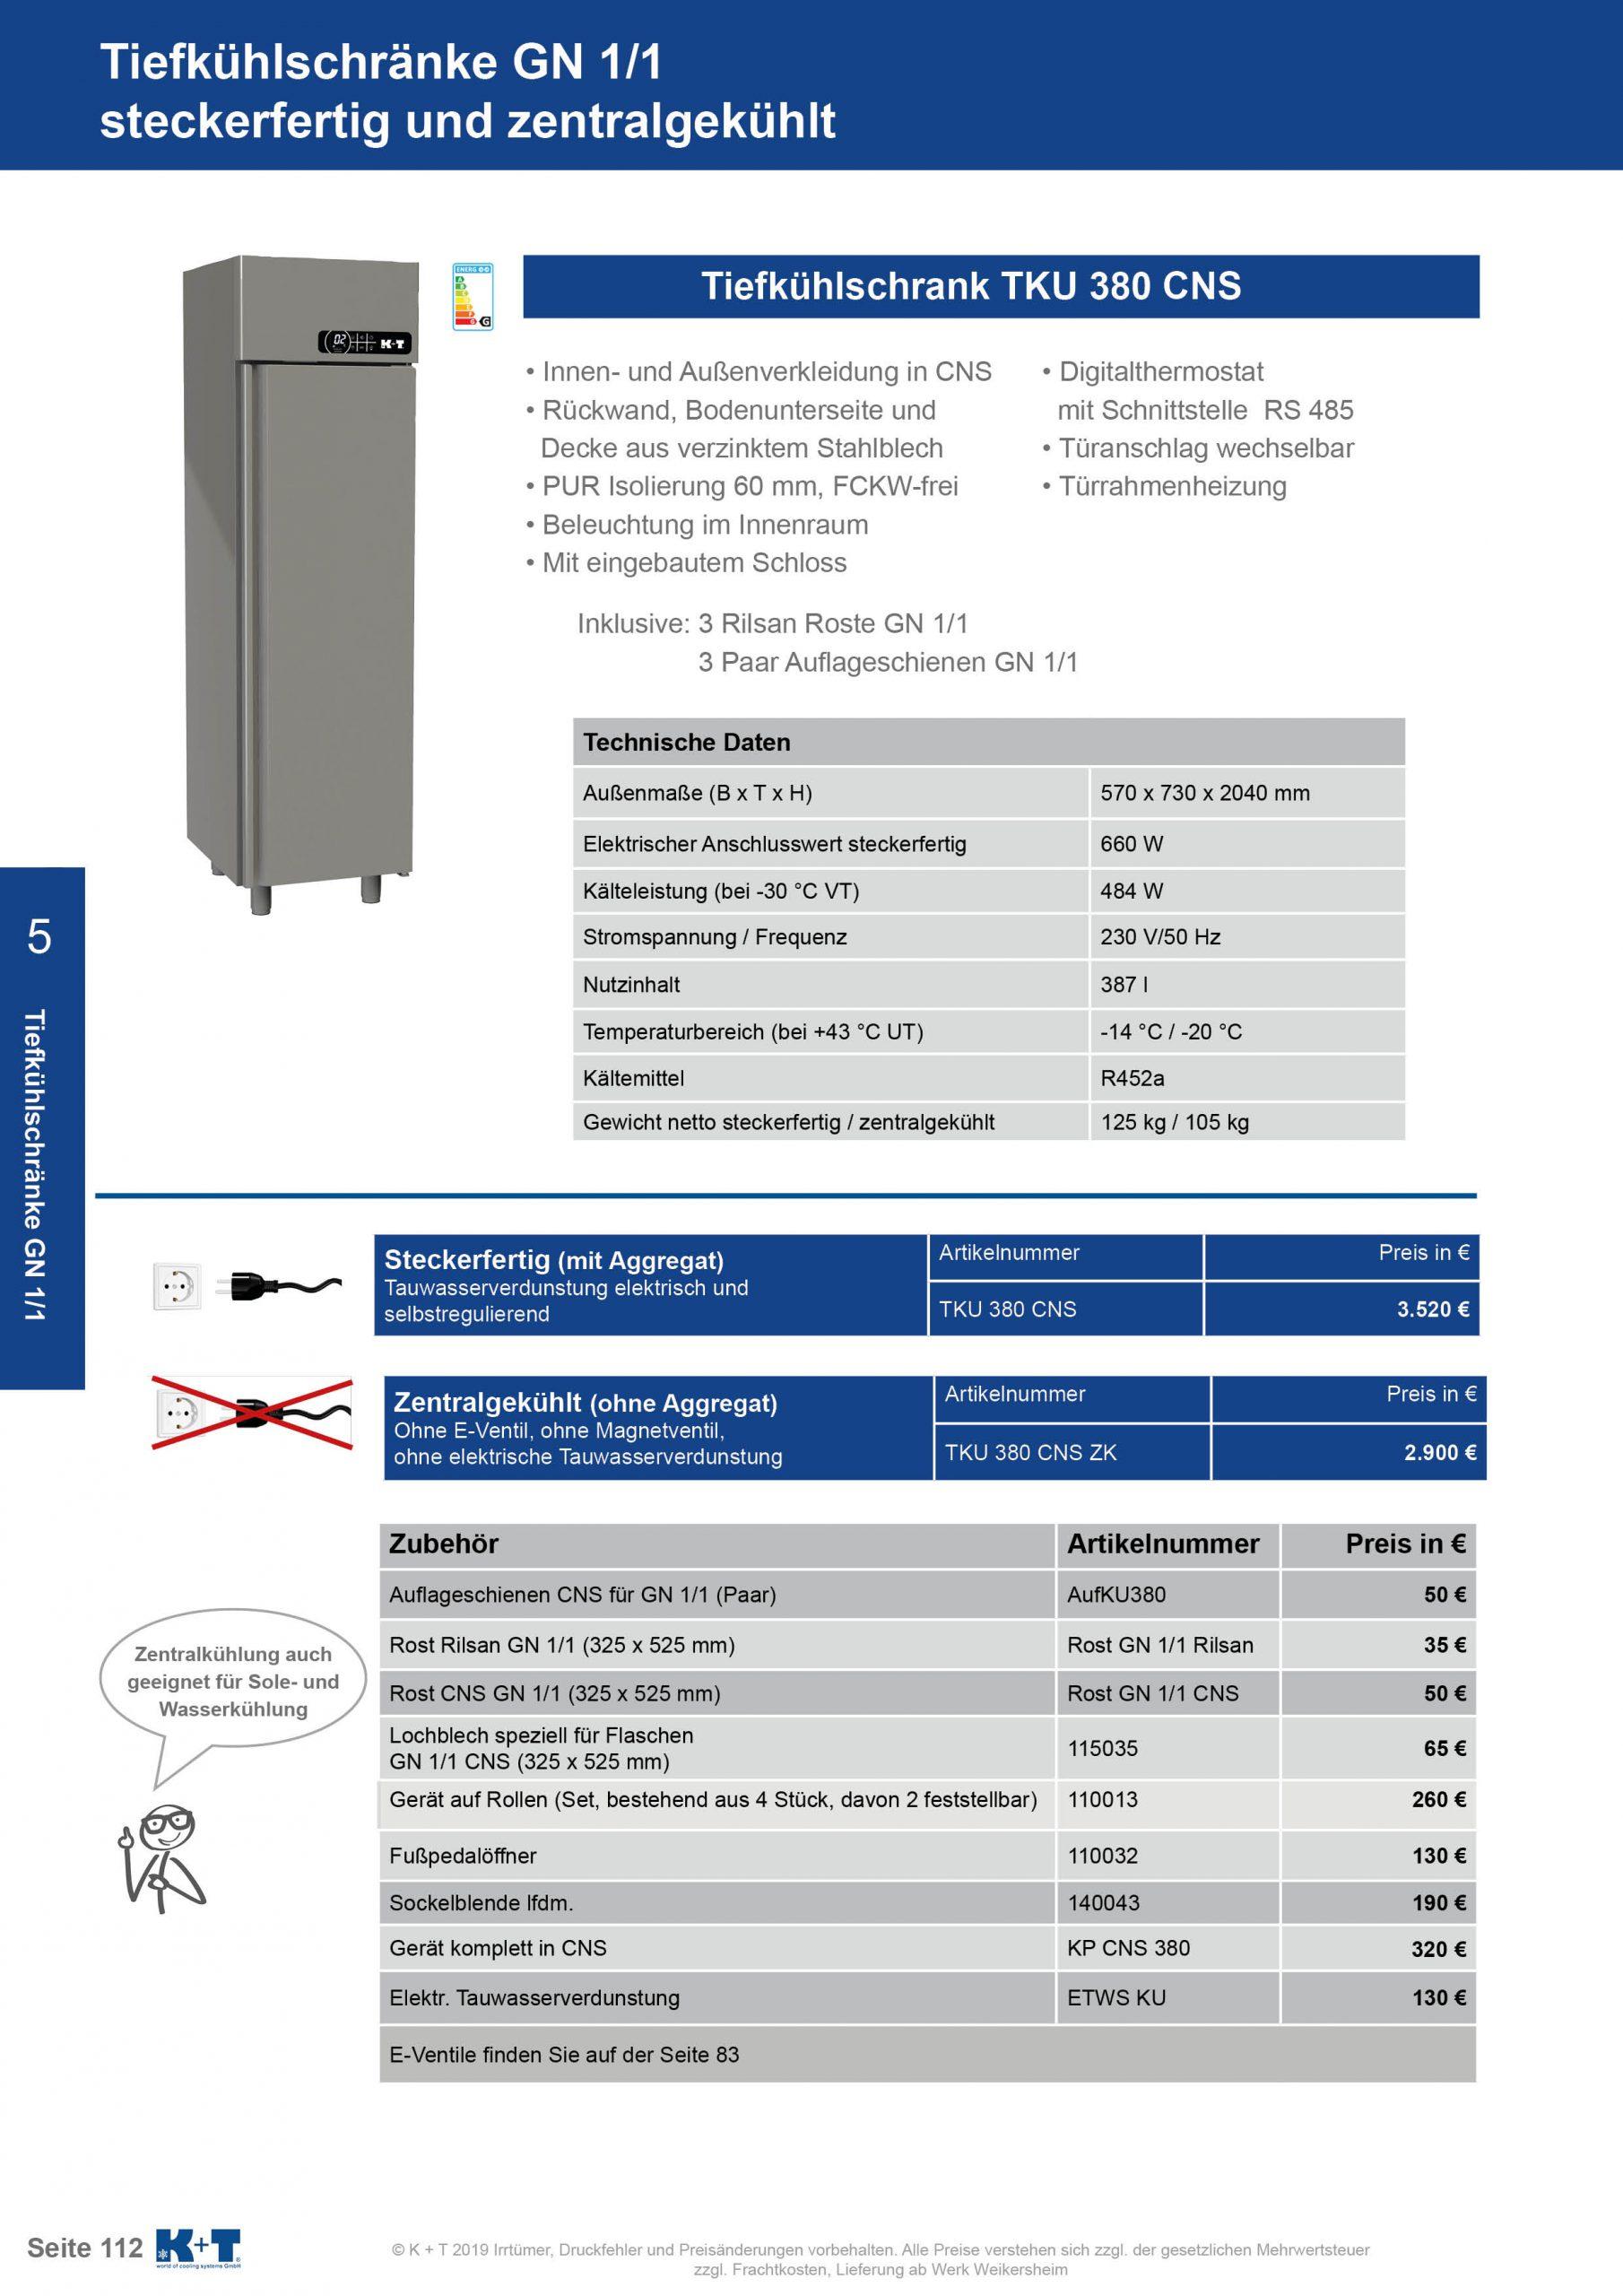 Tiefkühlschränke GN 1_1 Tiefkühlschrank zentralgekühlt